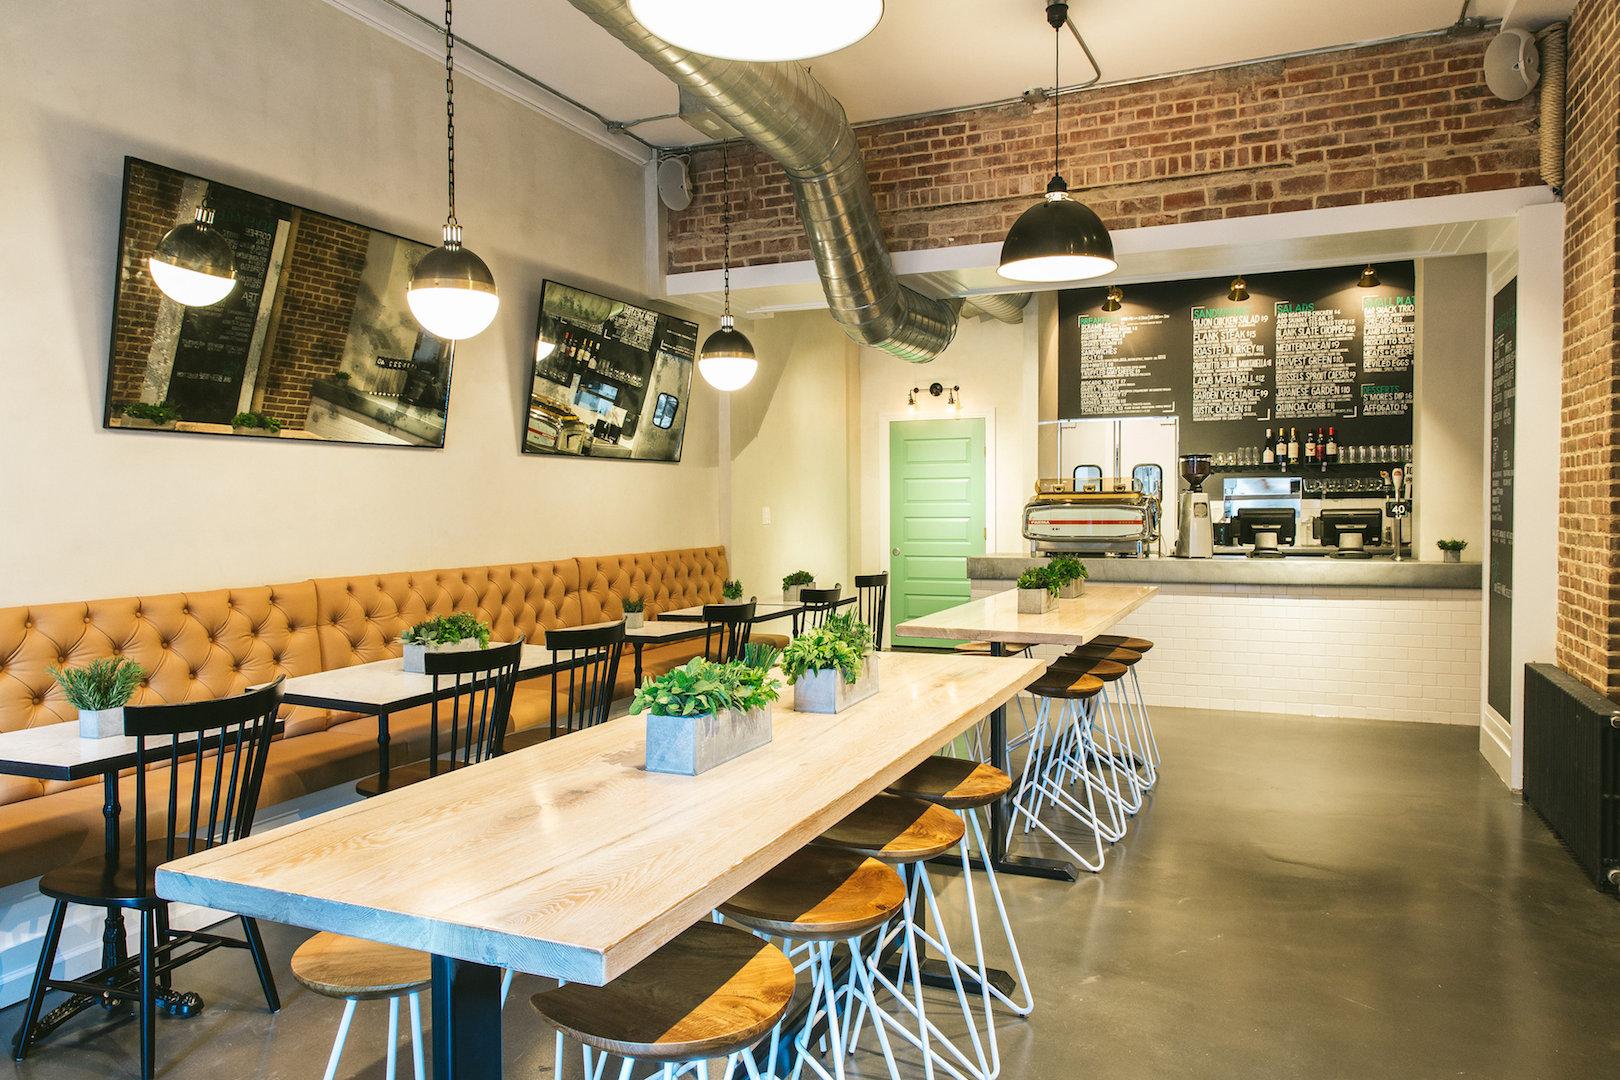 blank-slate-coffe-kitchen-nyc-nomad